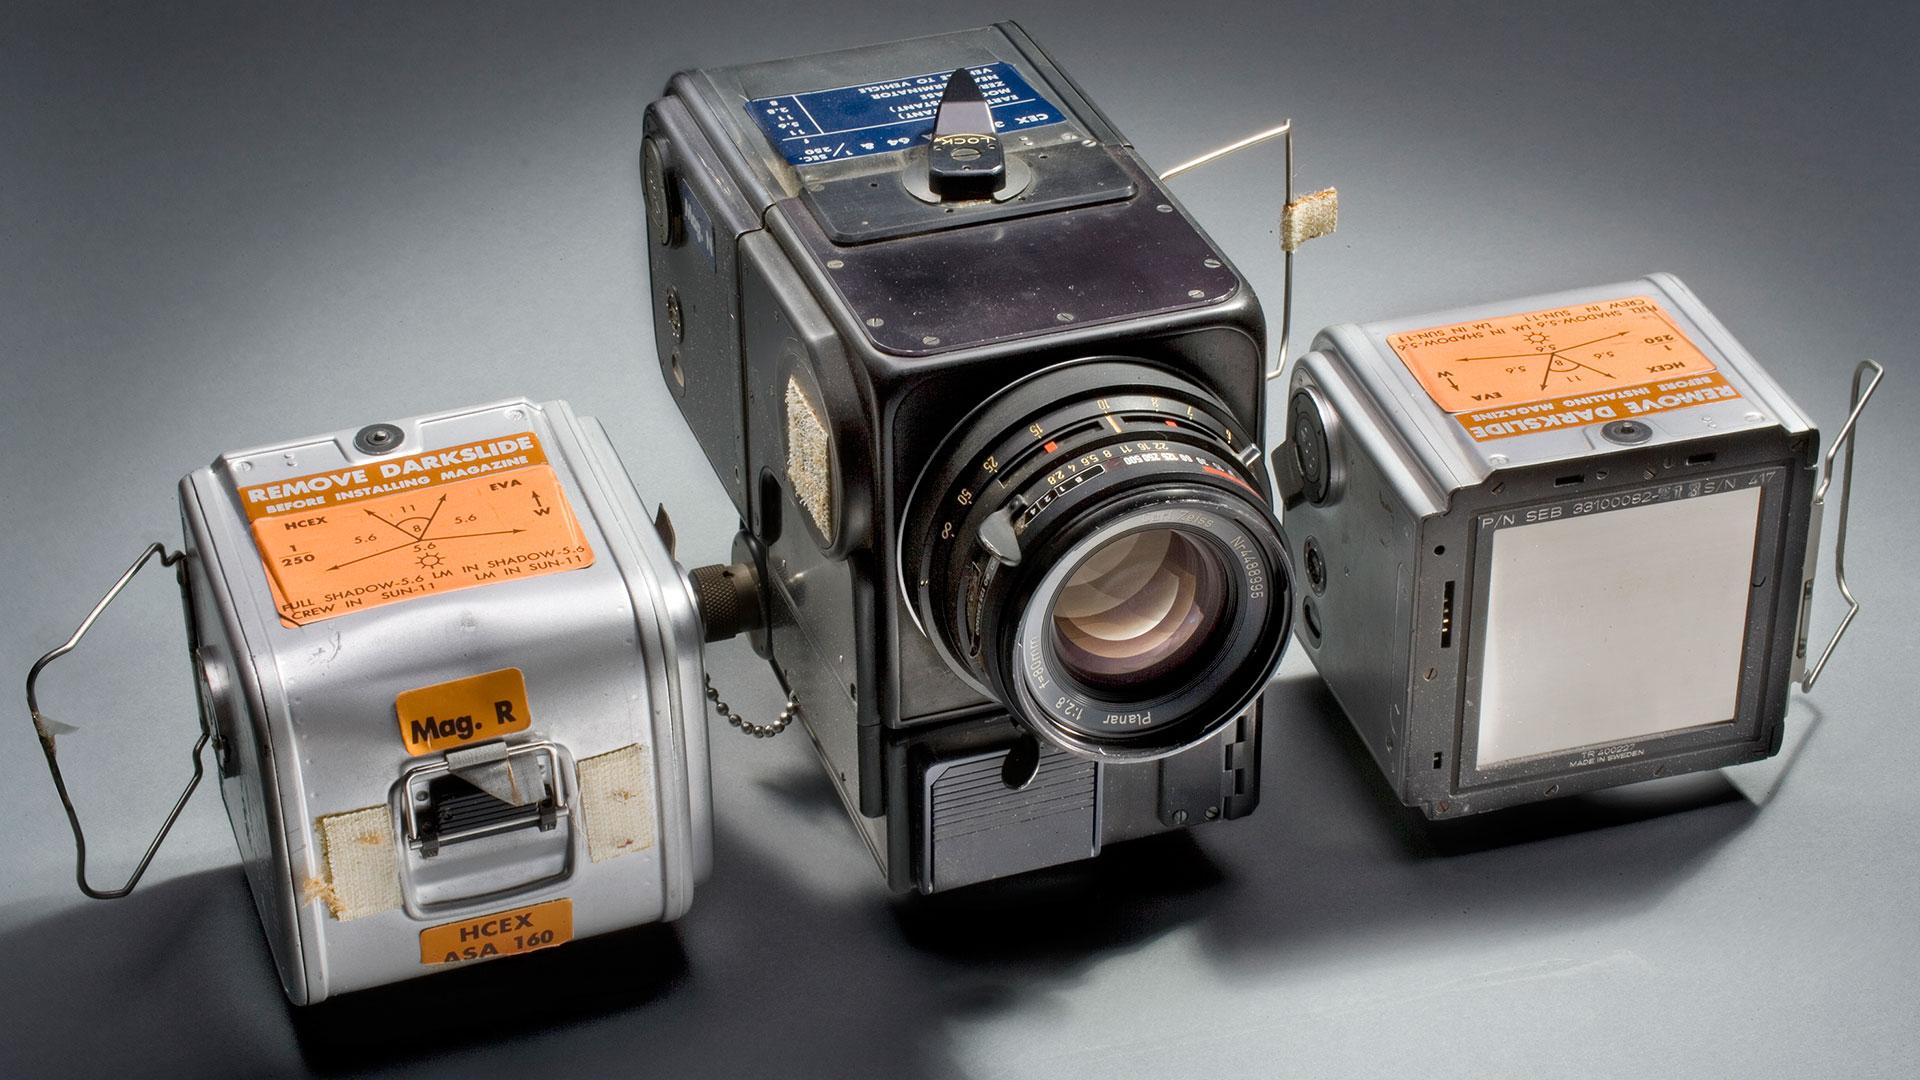 Hasselblad Lunar Camera hero asset